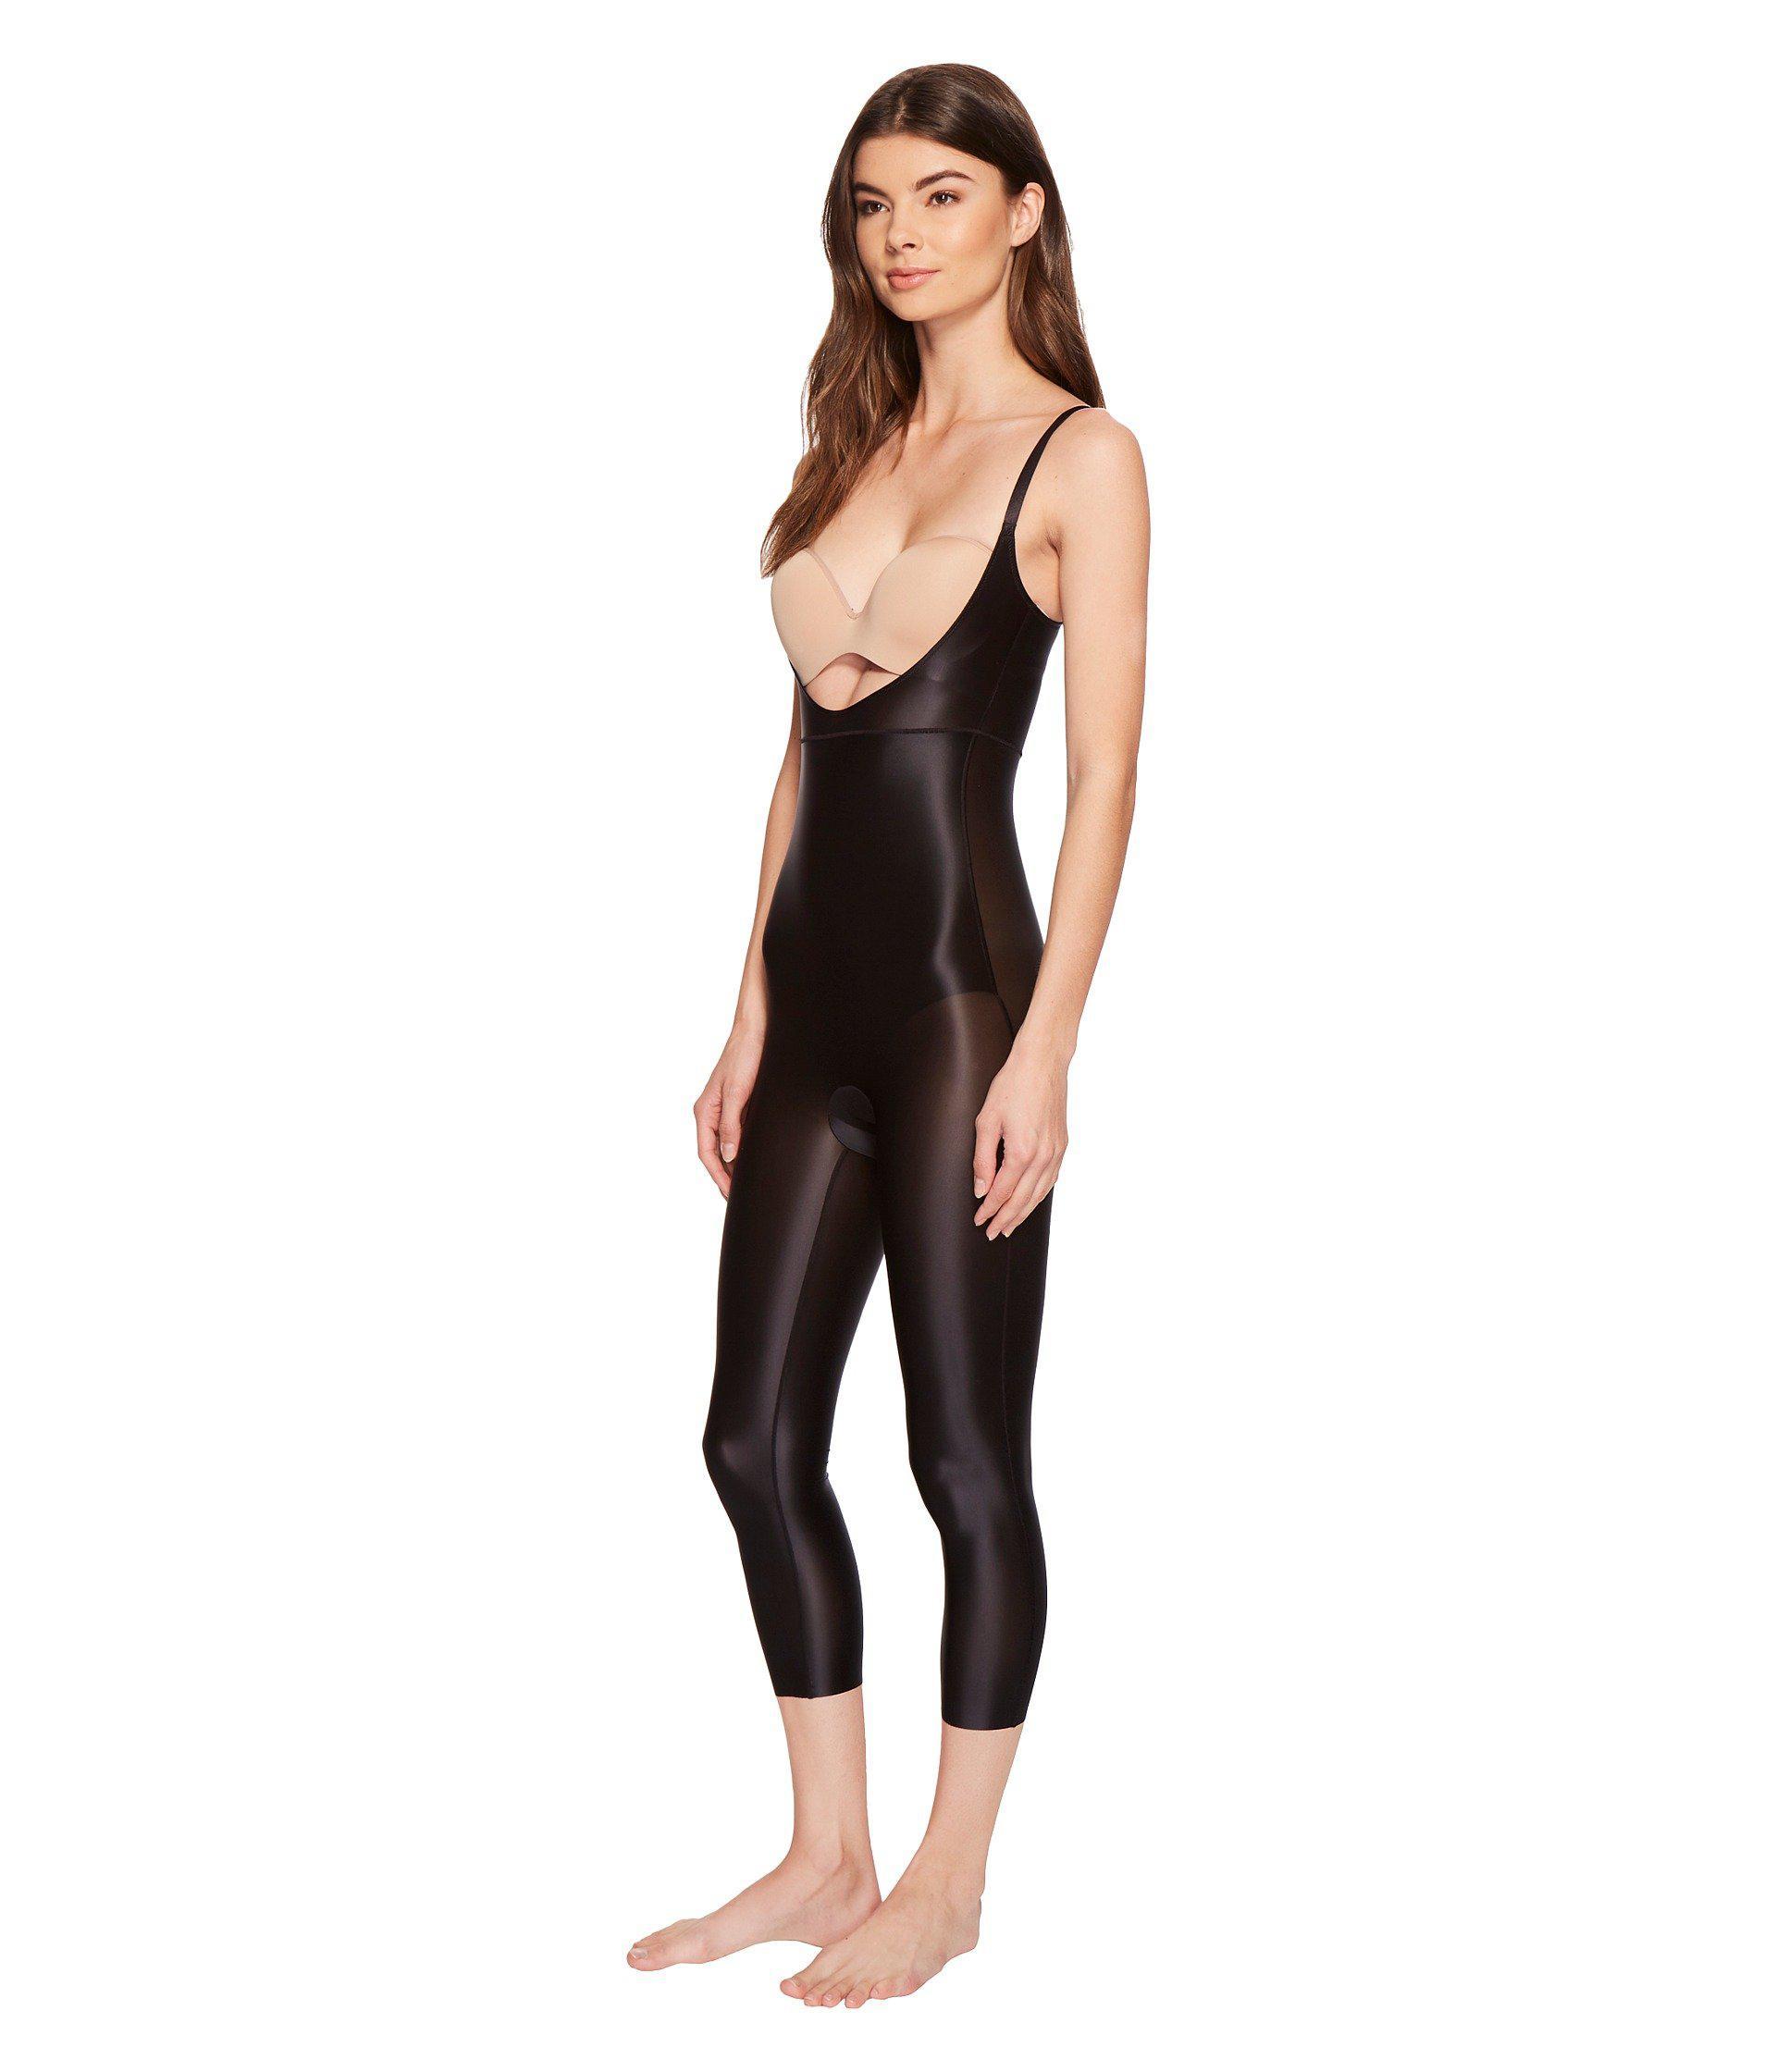 7ae7b68b71e Lyst - Spanx Suit Your Fancy Open-bust Catsuit (broadway Beige) Women s  Jumpsuit   Rompers One Piece in Black